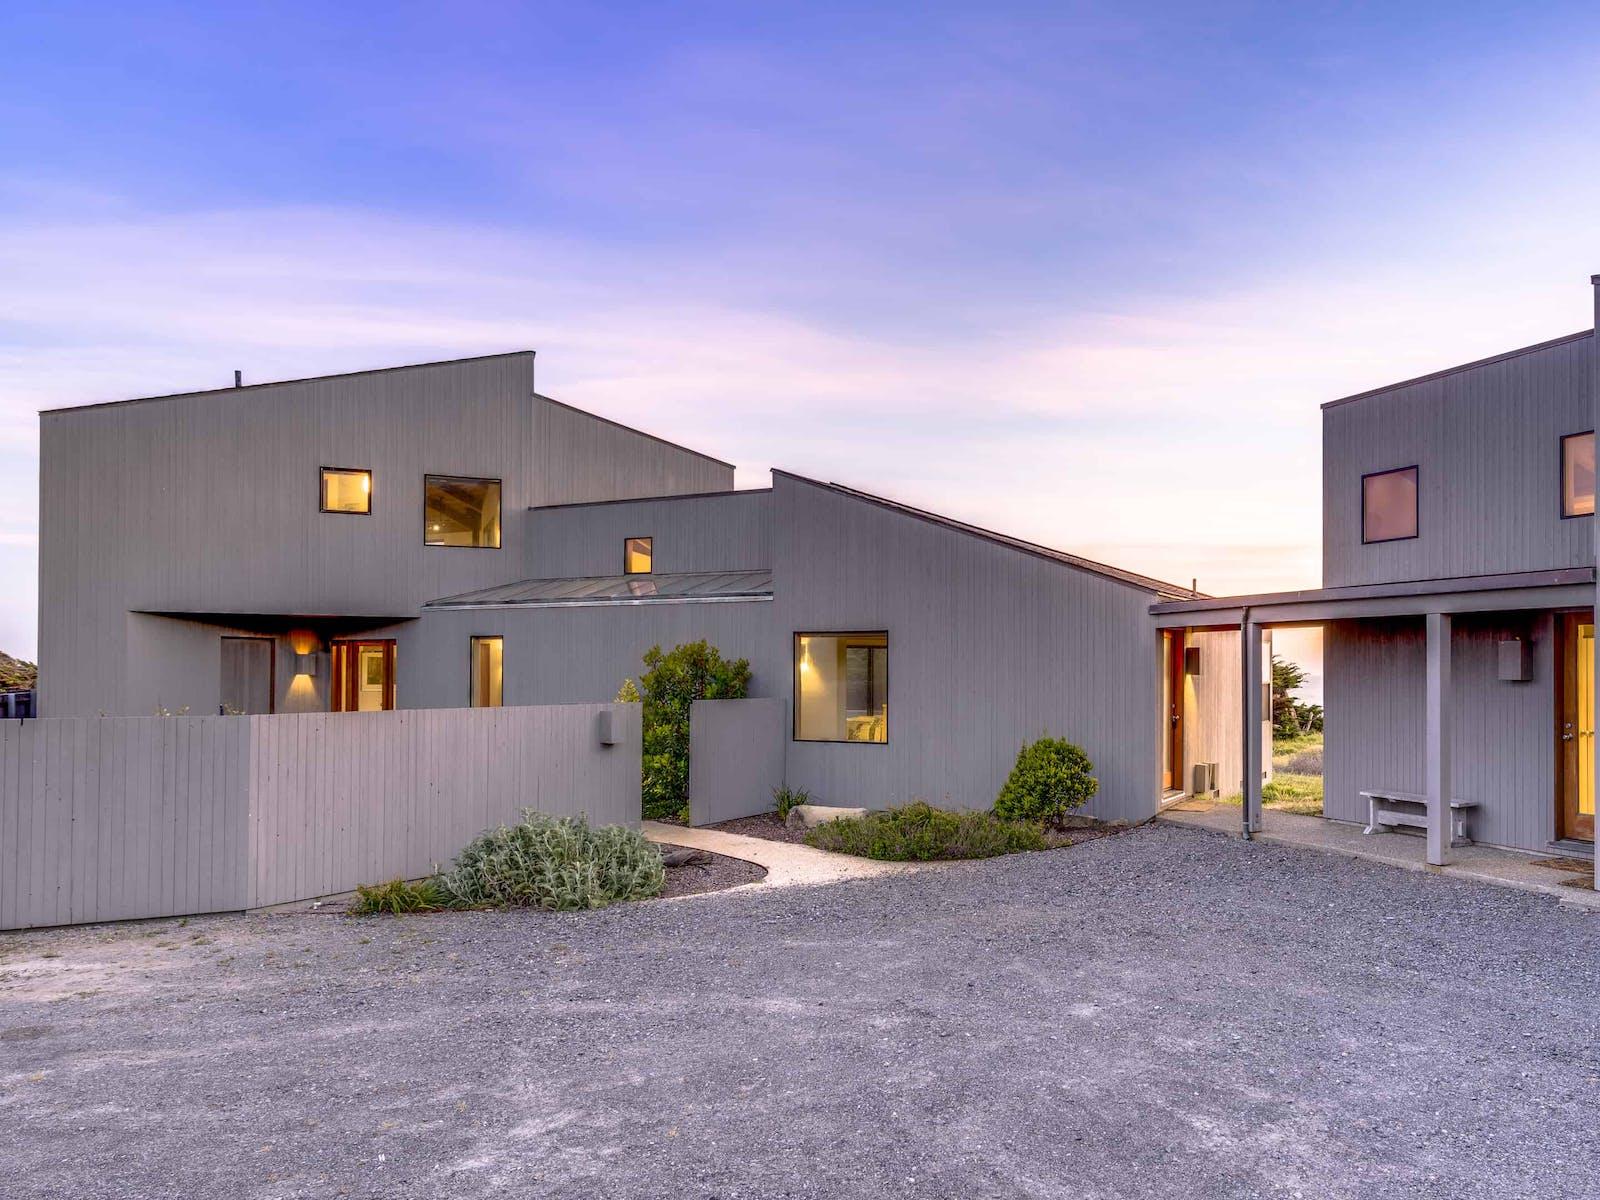 a beach house in Sea Ranch, CA with unique architecture